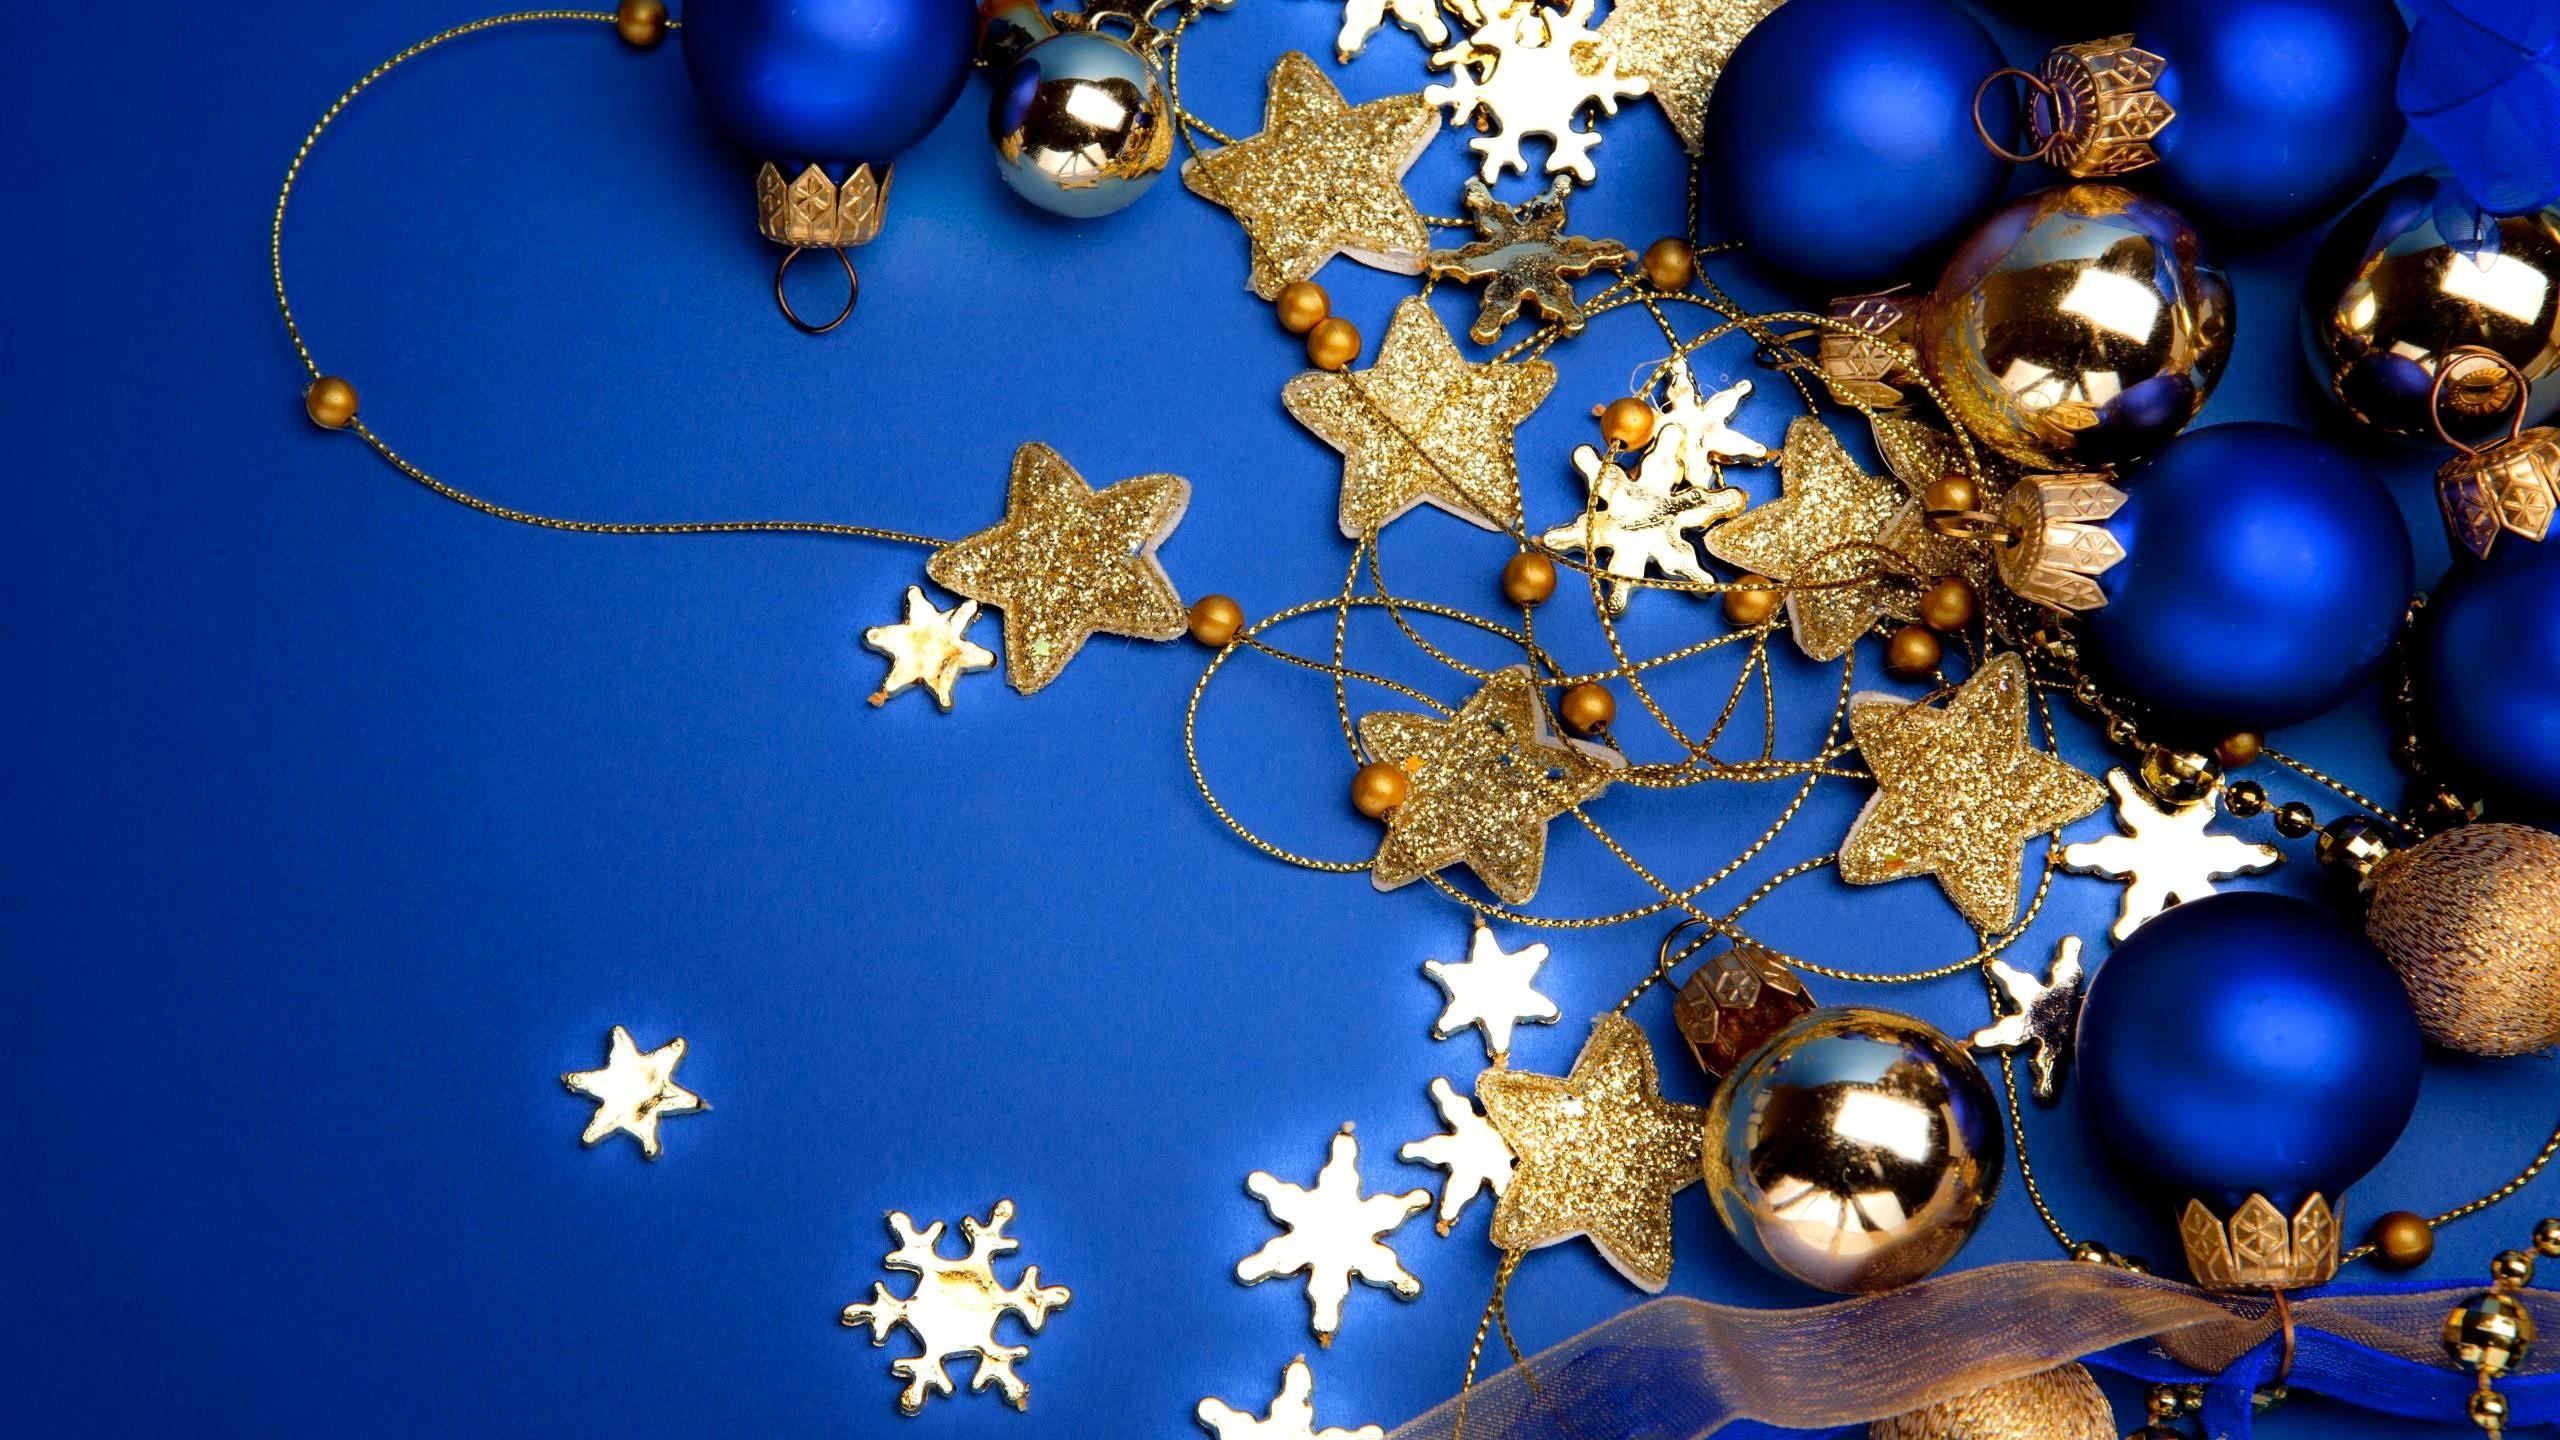 Blue Christmas Wallpaper.